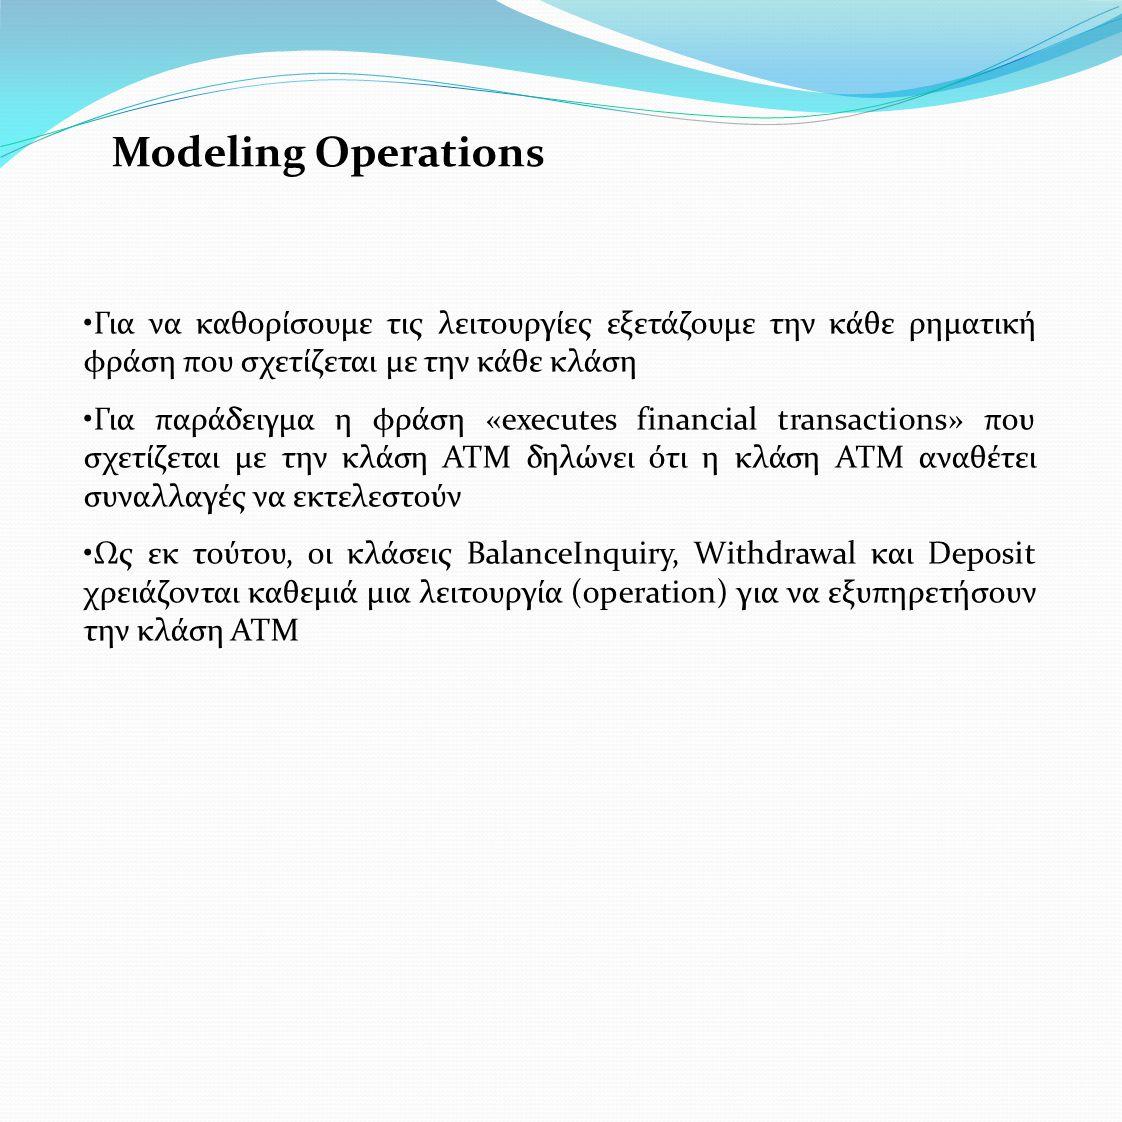 Modeling Operations •Για να καθορίσουμε τις λειτουργίες εξετάζουμε την κάθε ρηματική φράση που σχετίζεται με την κάθε κλάση •Για παράδειγμα η φράση «executes financial transactions» που σχετίζεται με την κλάση ΑΤΜ δηλώνει ότι η κλάση ΑΤΜ αναθέτει συναλλαγές να εκτελεστούν •Ως εκ τούτου, οι κλάσεις BalanceInquiry, Withdrawal και Deposit χρειάζονται καθεμιά μια λειτουργία (operation) για να εξυπηρετήσουν την κλάση ΑΤΜ